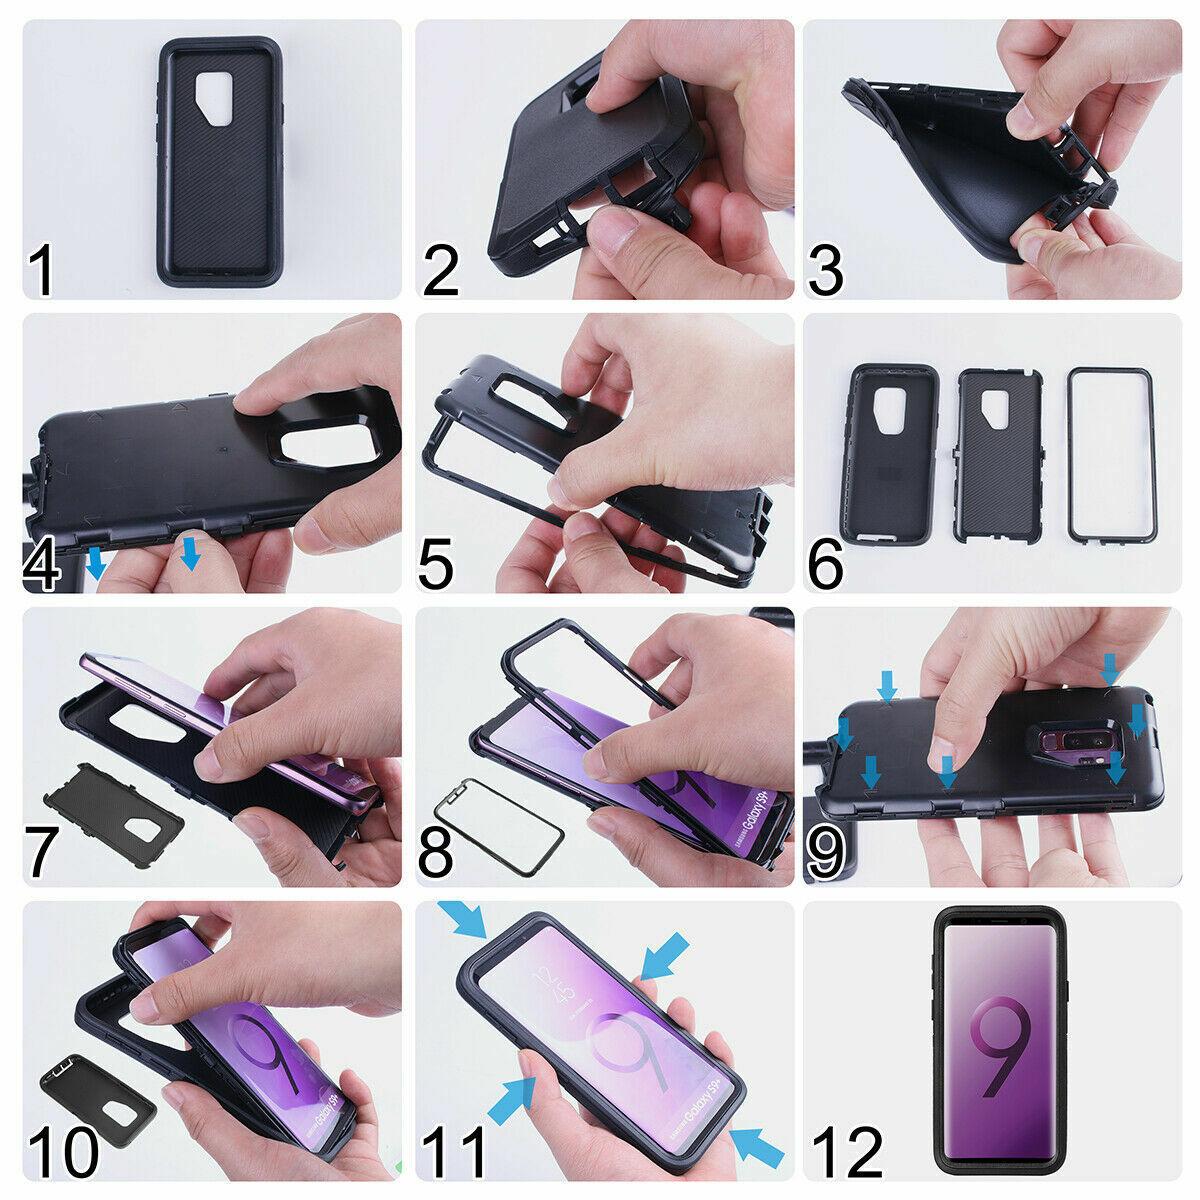 Купить Unbranded/Generic - For Samsung Galaxy S9 / S9 Plus Defender Case Rugged Shockproof w/ Belt Holster